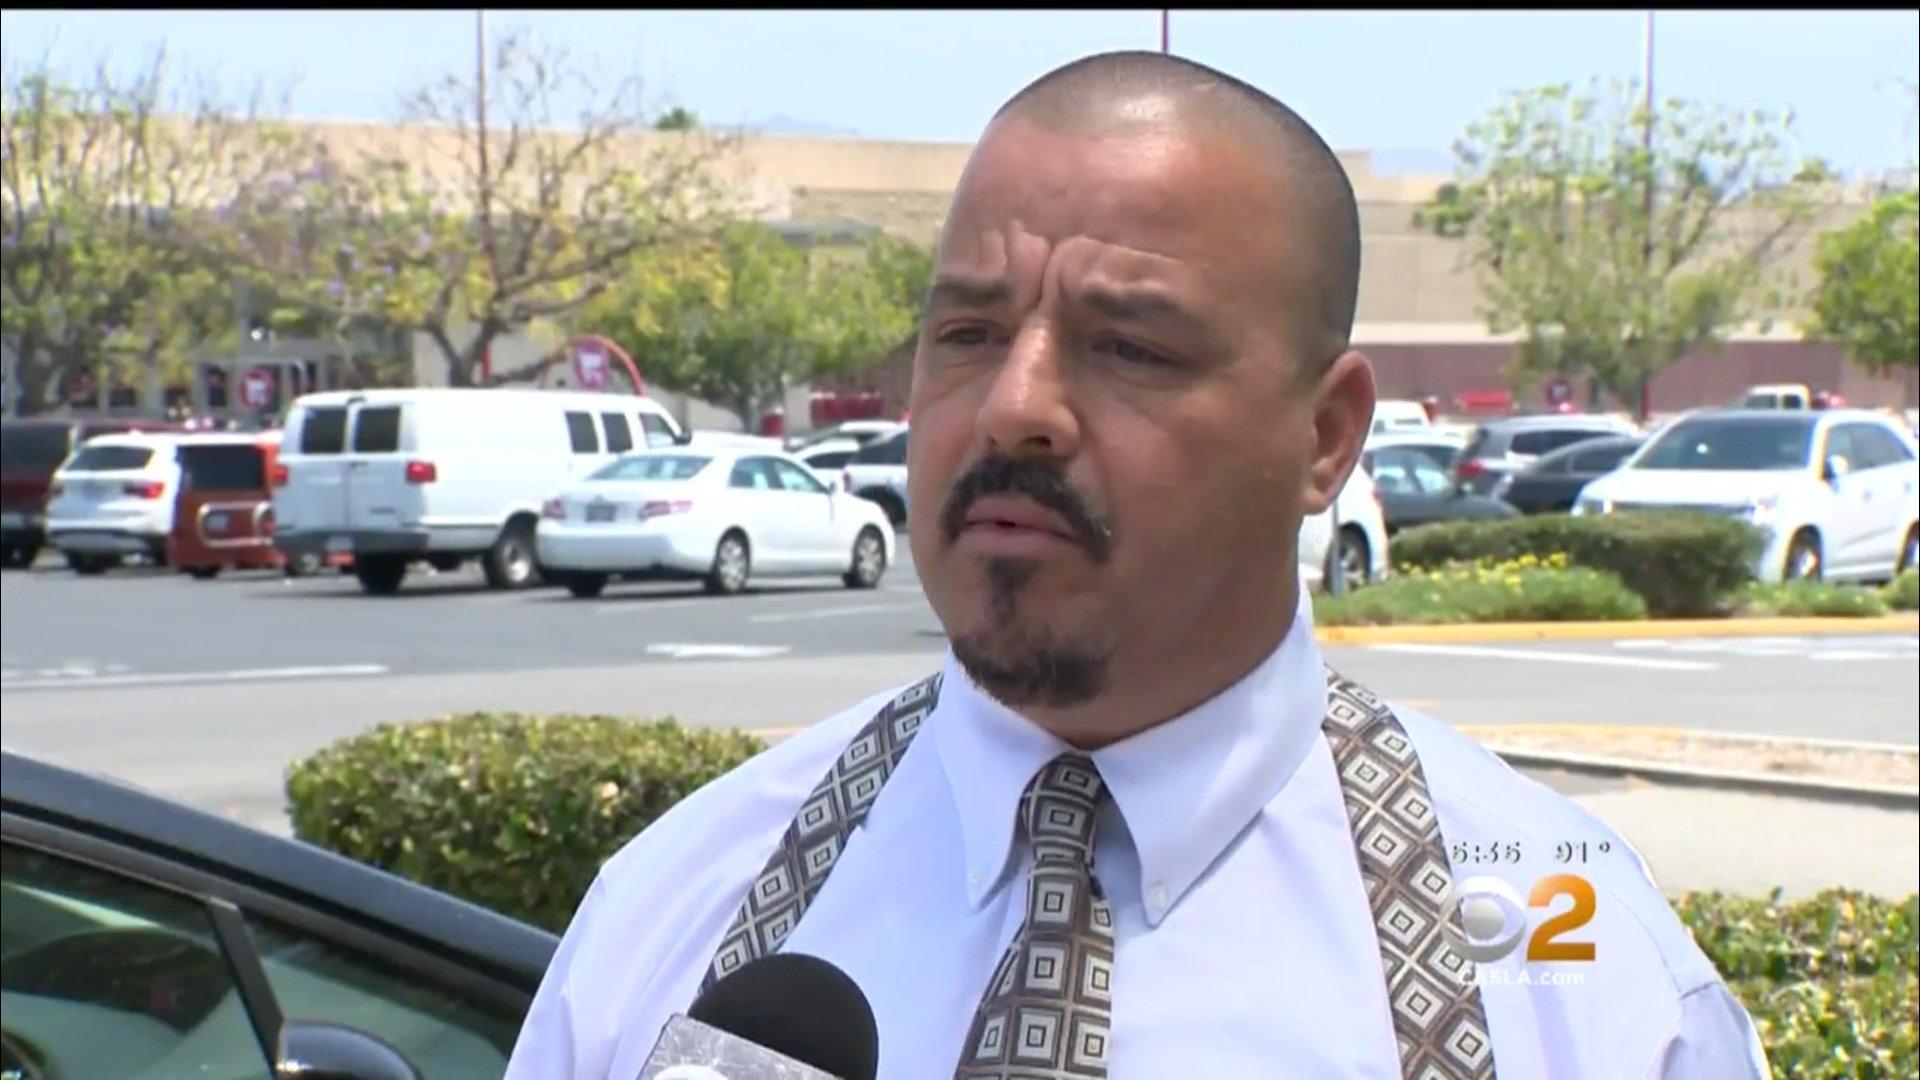 Our hero, Jay Lopez. Image via CBS Los Angeles.